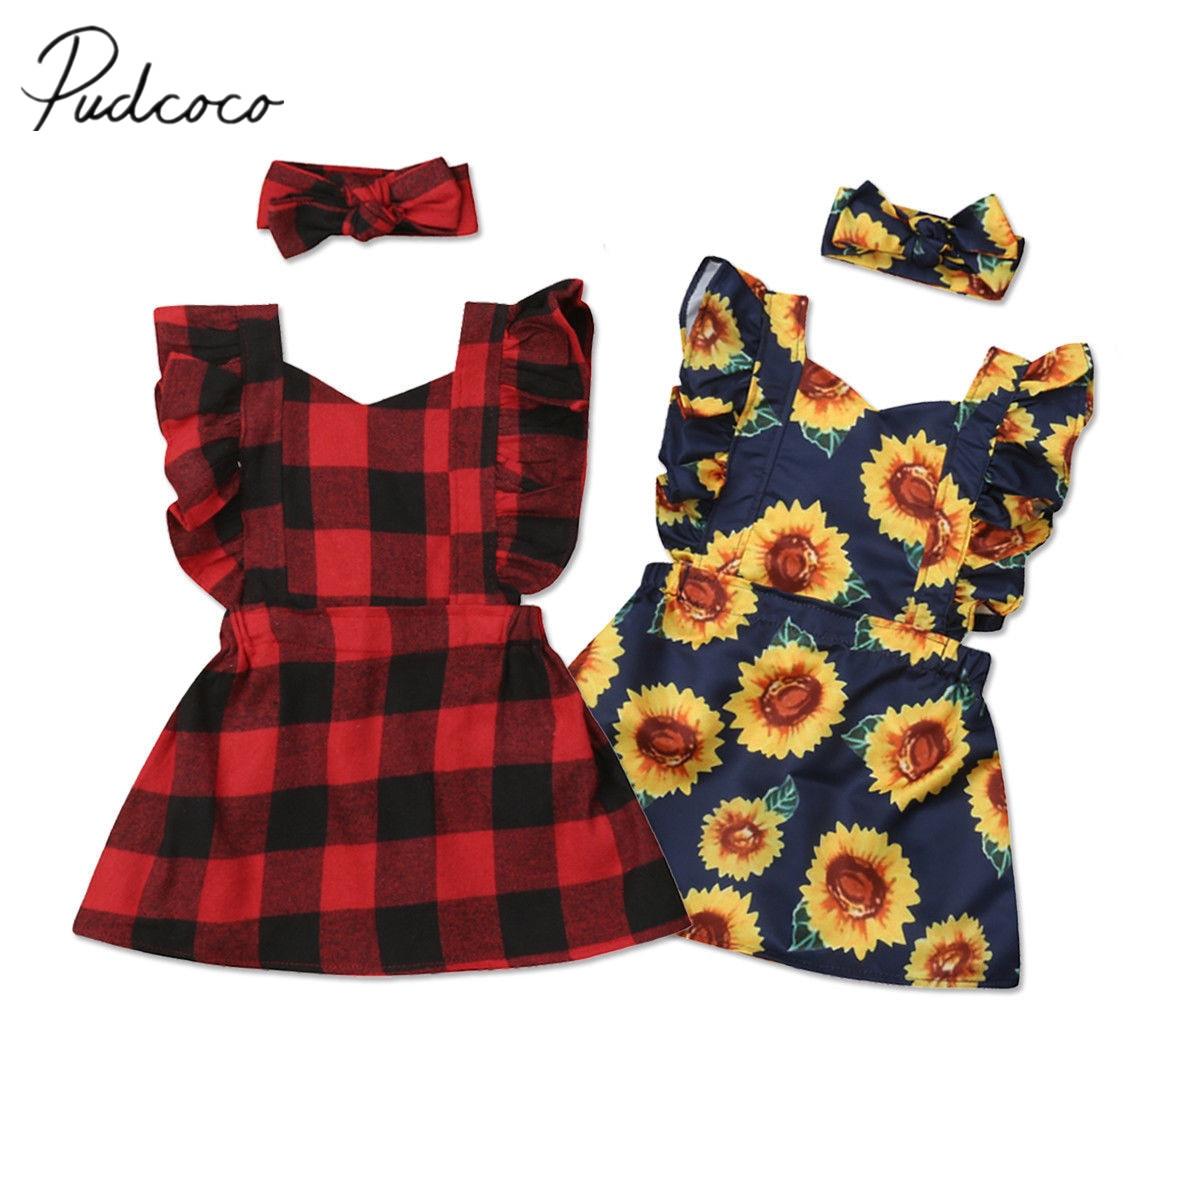 c064e8fb8cd06 2018 Brand New Xmas Princess Infant Kids Baby Girl 2Pcs Dress  Sunflowers/Plaid Ruffles Sleeve Backless A-Line Sundress+Headband